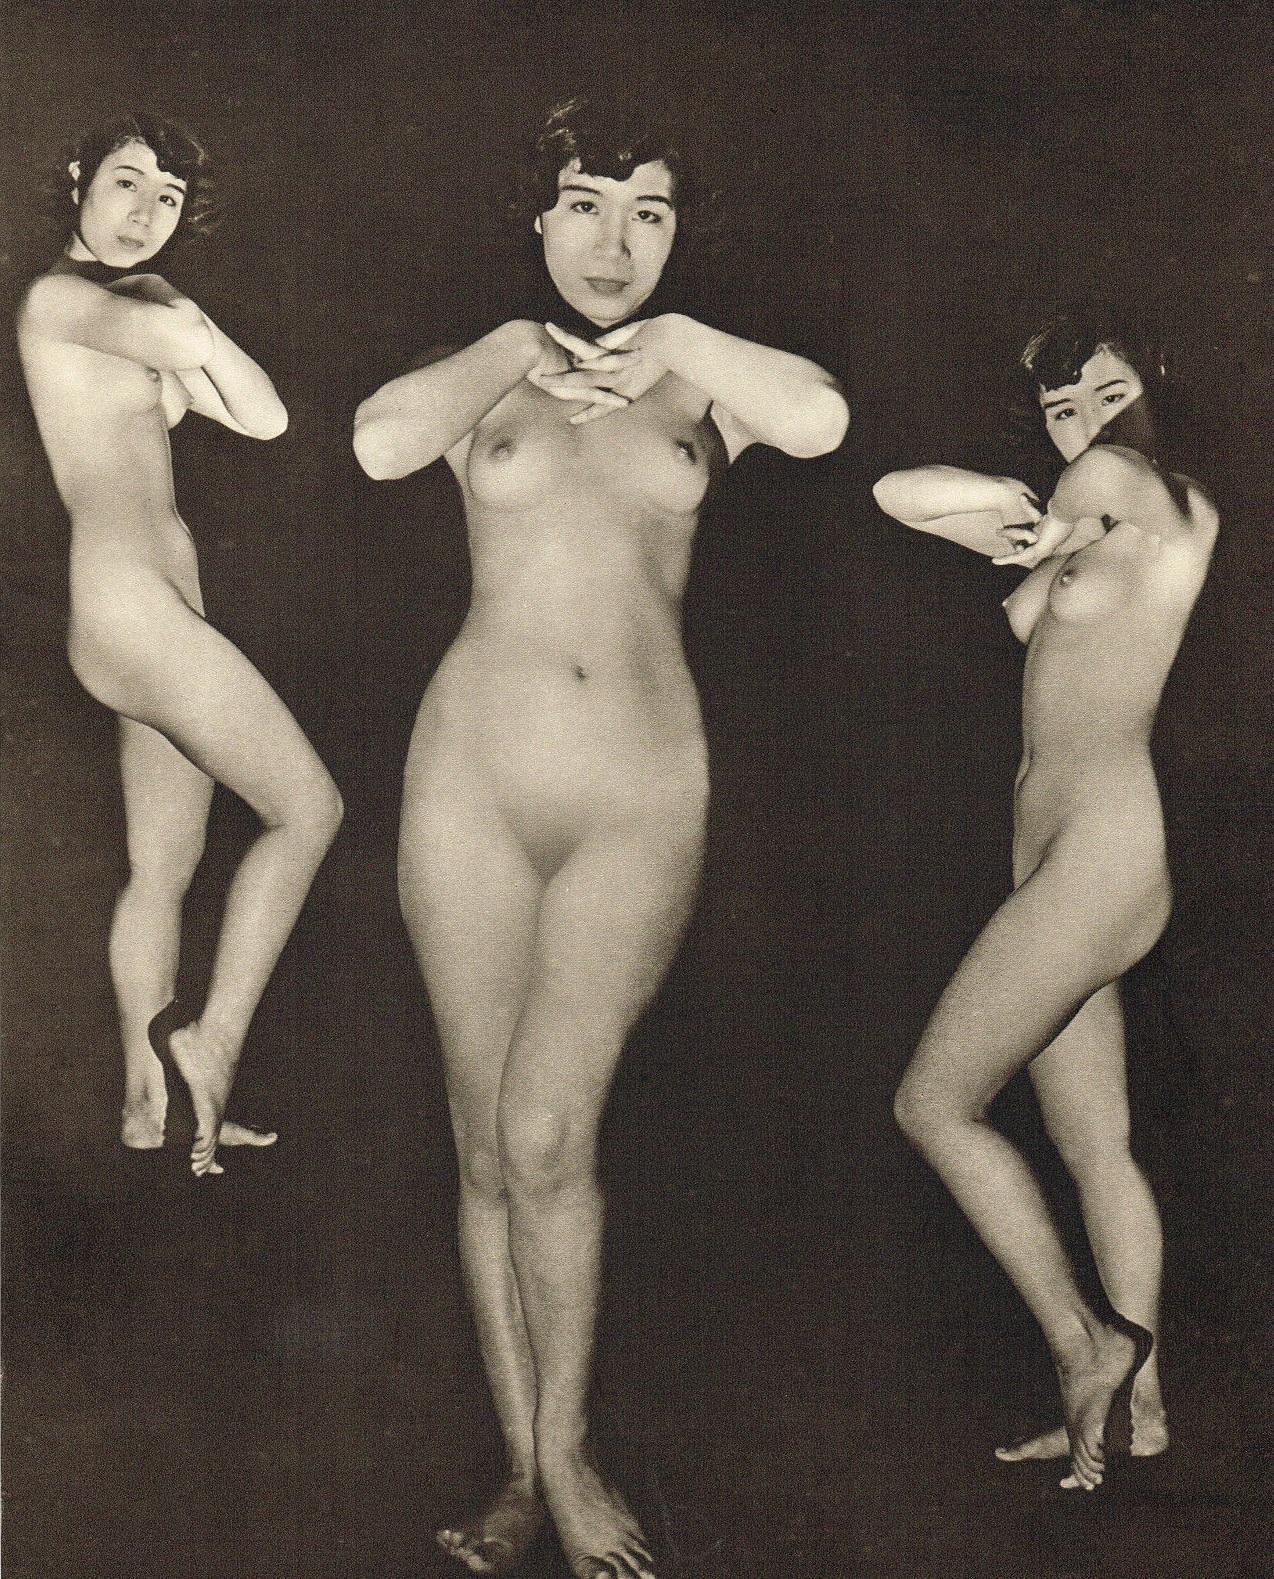 John Everard.photomontage Japanese Nude, photogravure 1950Oriental Model Published by Robert Hale Ltd., London in 1955.